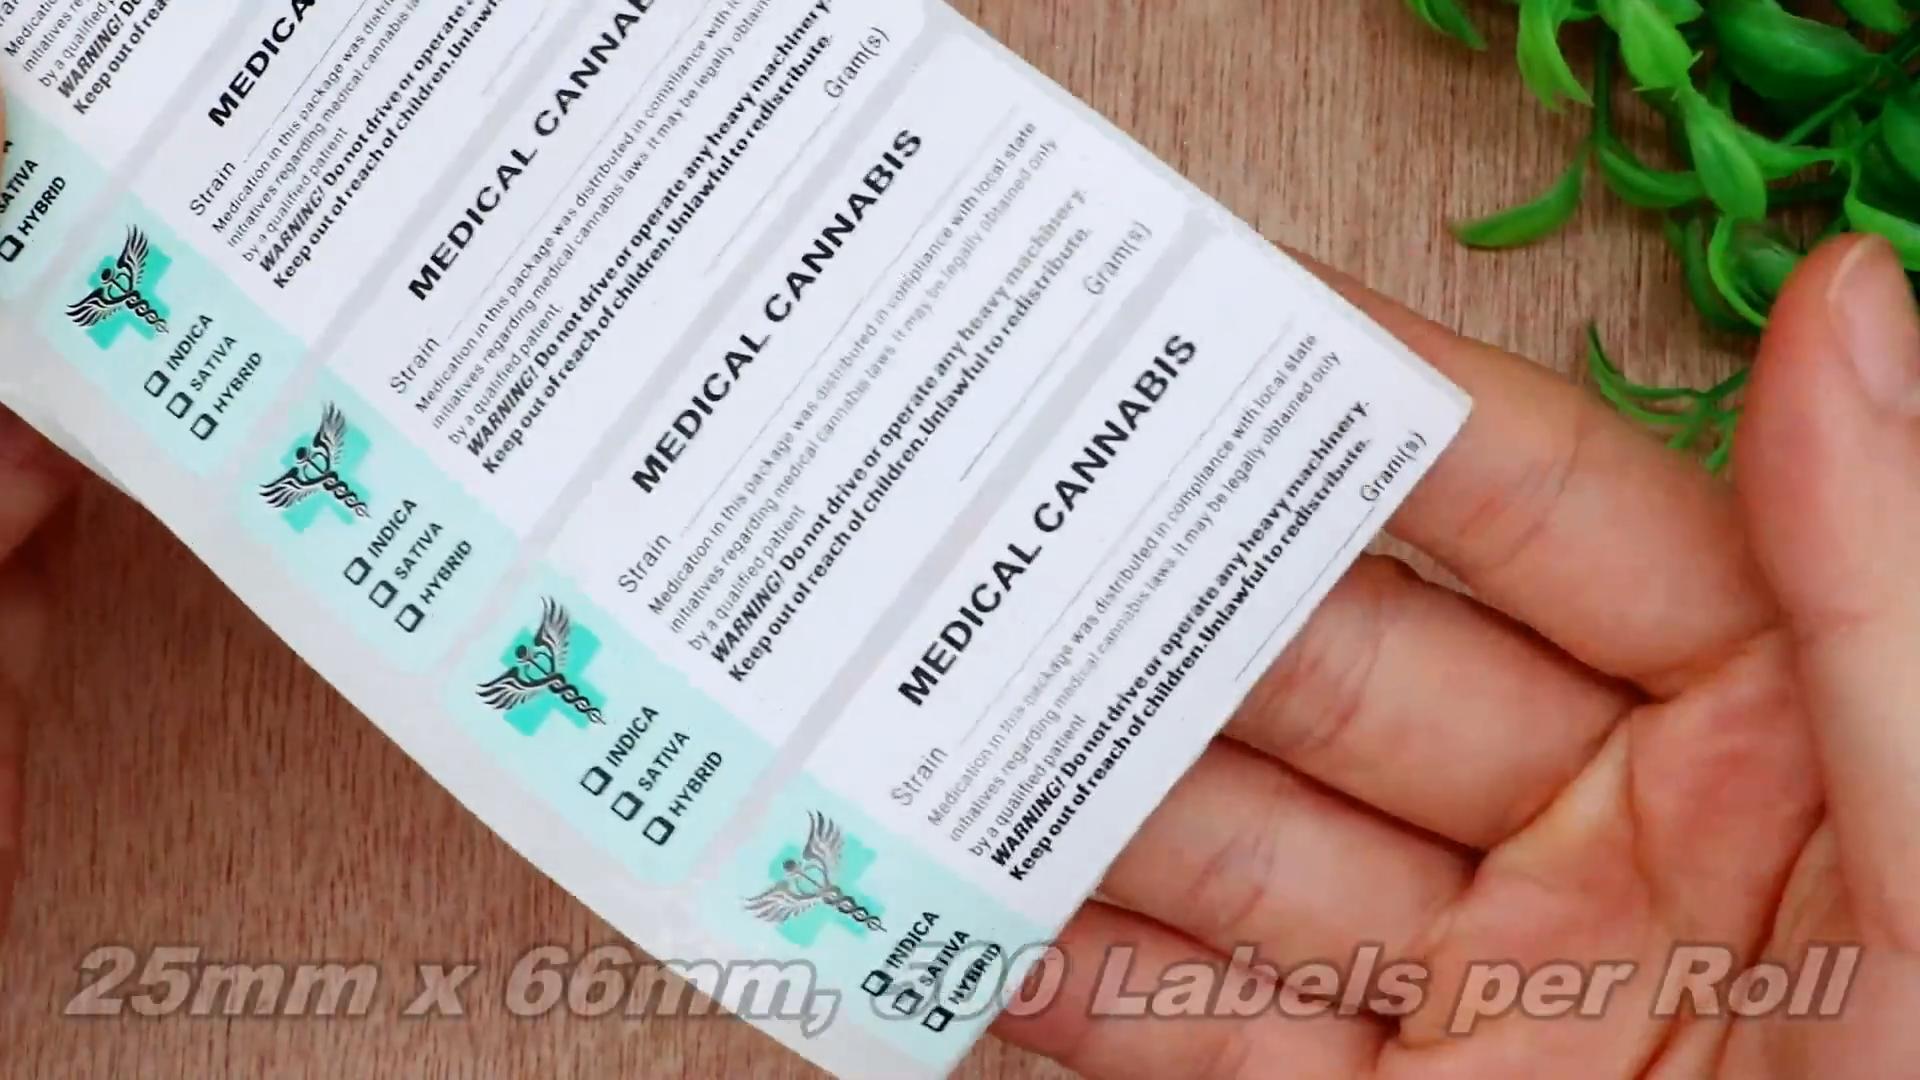 Hybsk genérico médico cepa etiquetas-Etiquetas de Estado a médicos olla etiquetas Sticky Icky identificador